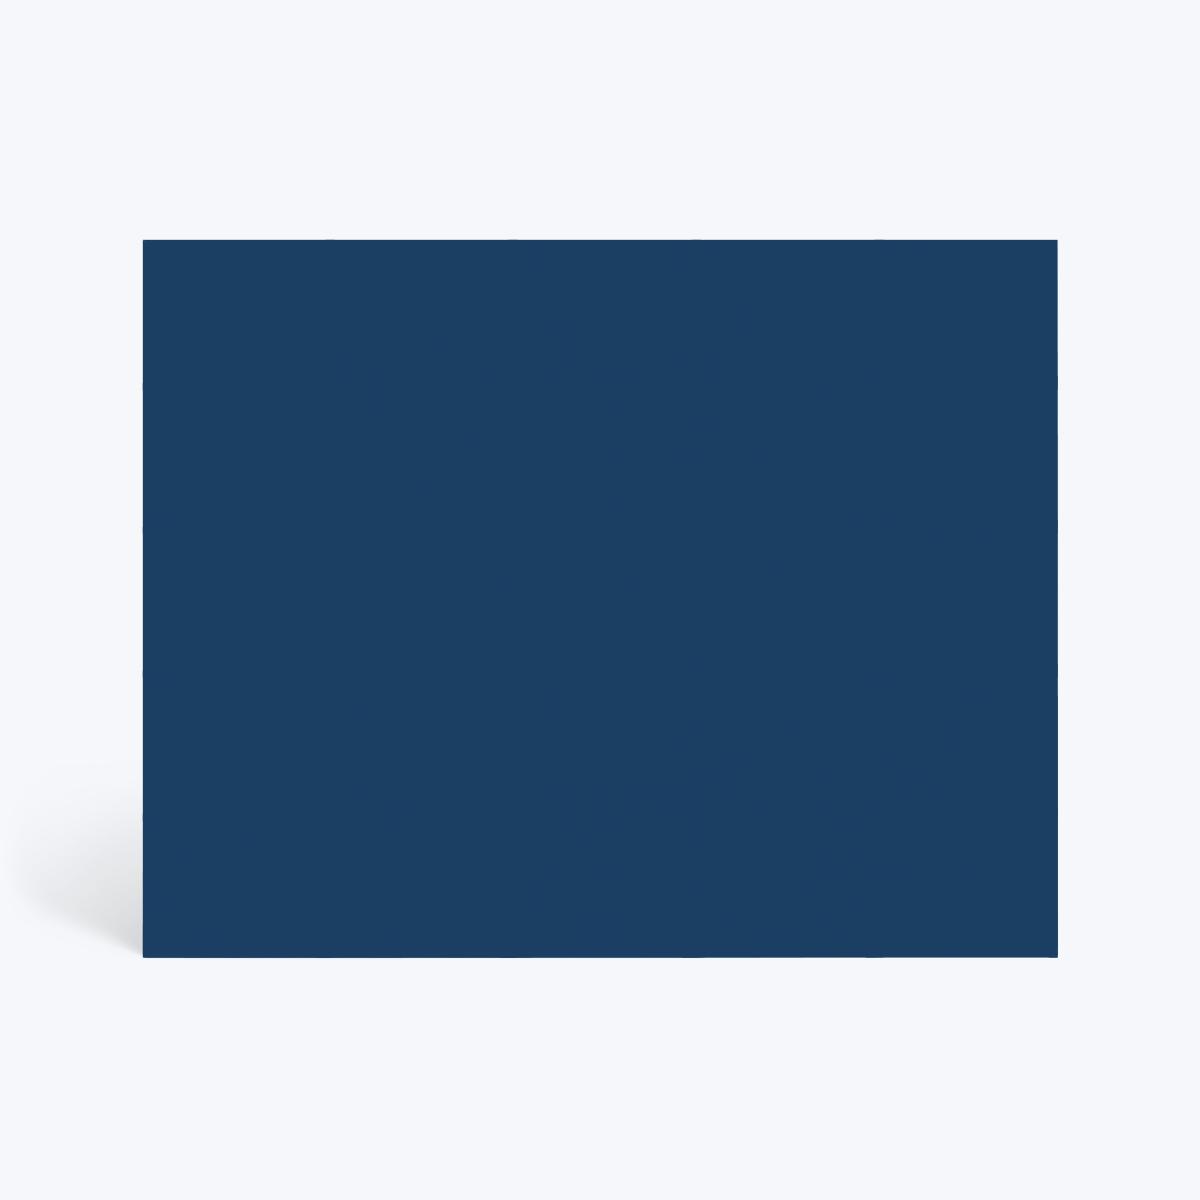 Https%3a%2f%2fwww.papier.com%2fproduct image%2f42722%2f29%2fcolour block 10908 back 1533632884.png?ixlib=rb 1.1